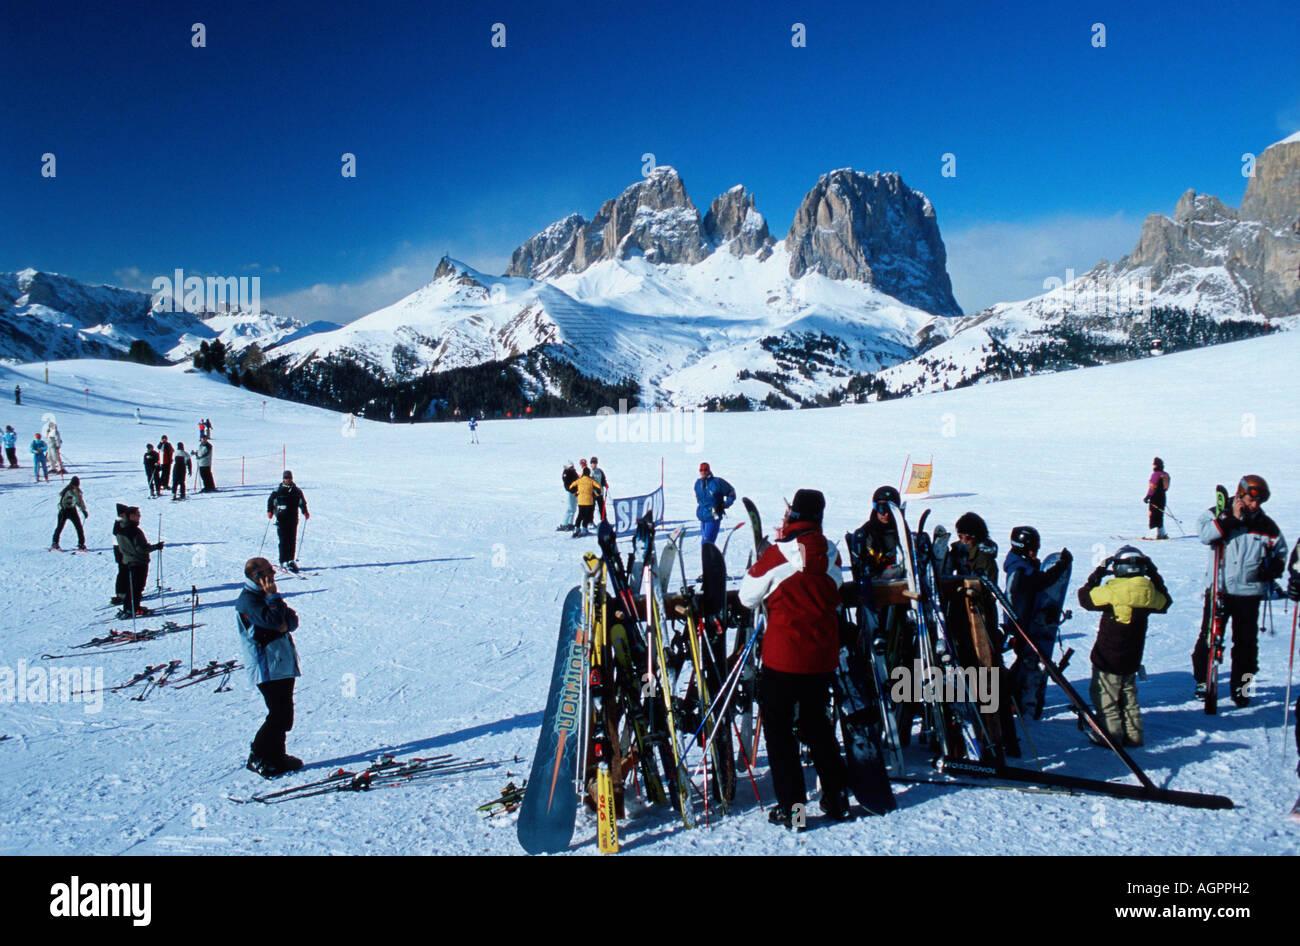 Skier at Pordoi Pass / Skifahrer am Pordoi-Pass - Stock Image